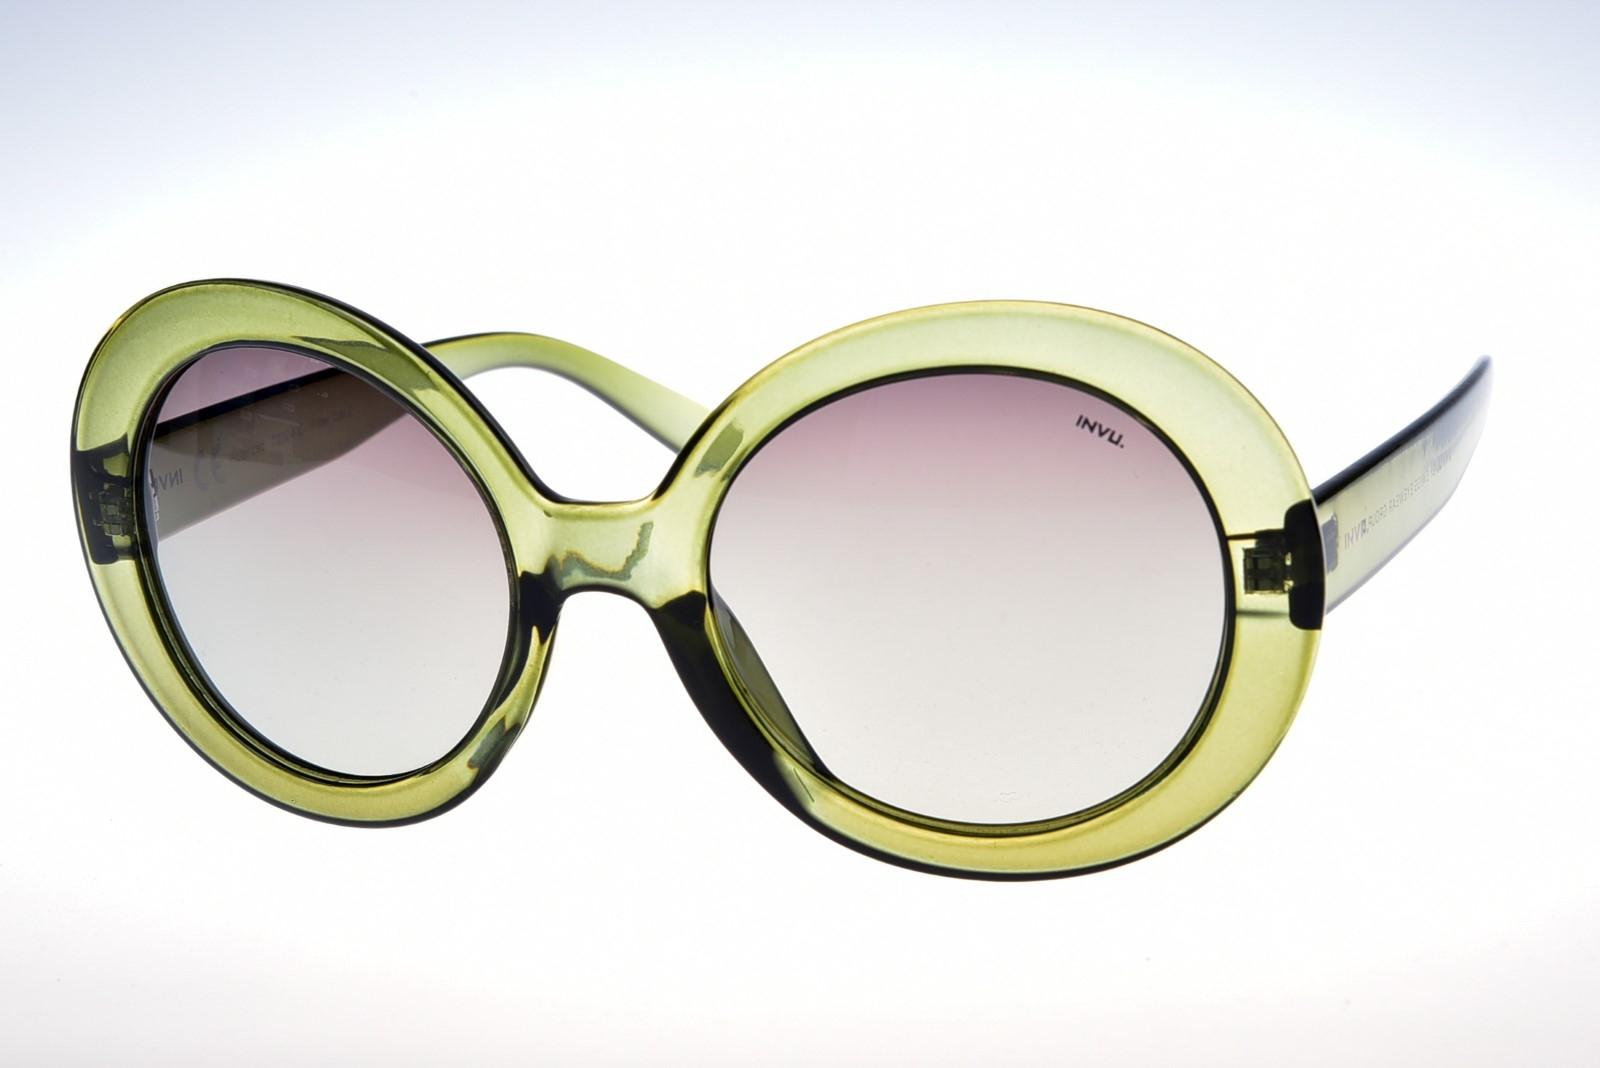 INVU. Trend T2004C - Dámske slnečné okuliare